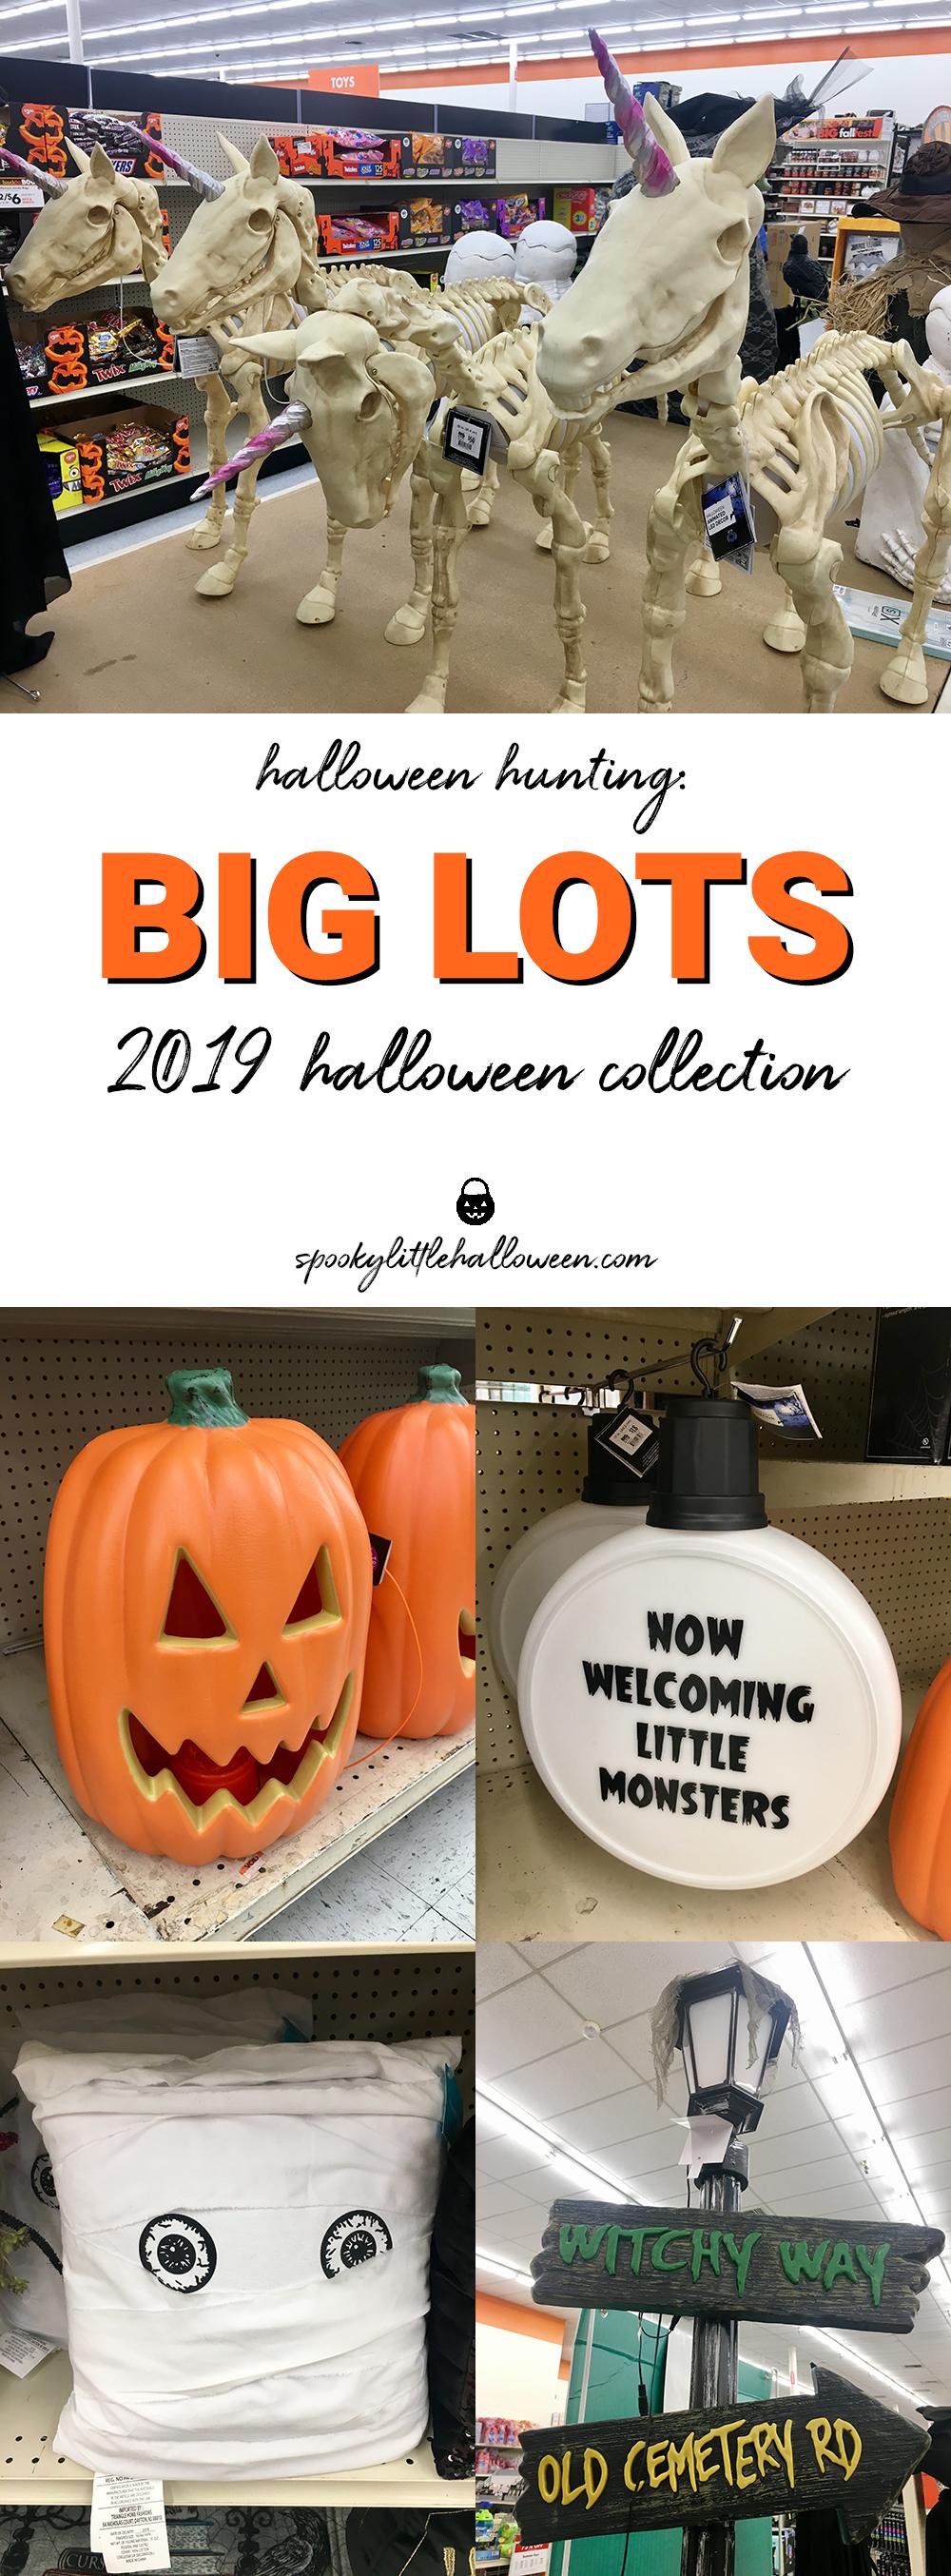 Big Lots Halloween Decorations 2019.Halloween Hunting Big Lots 2019 Halloween Collection